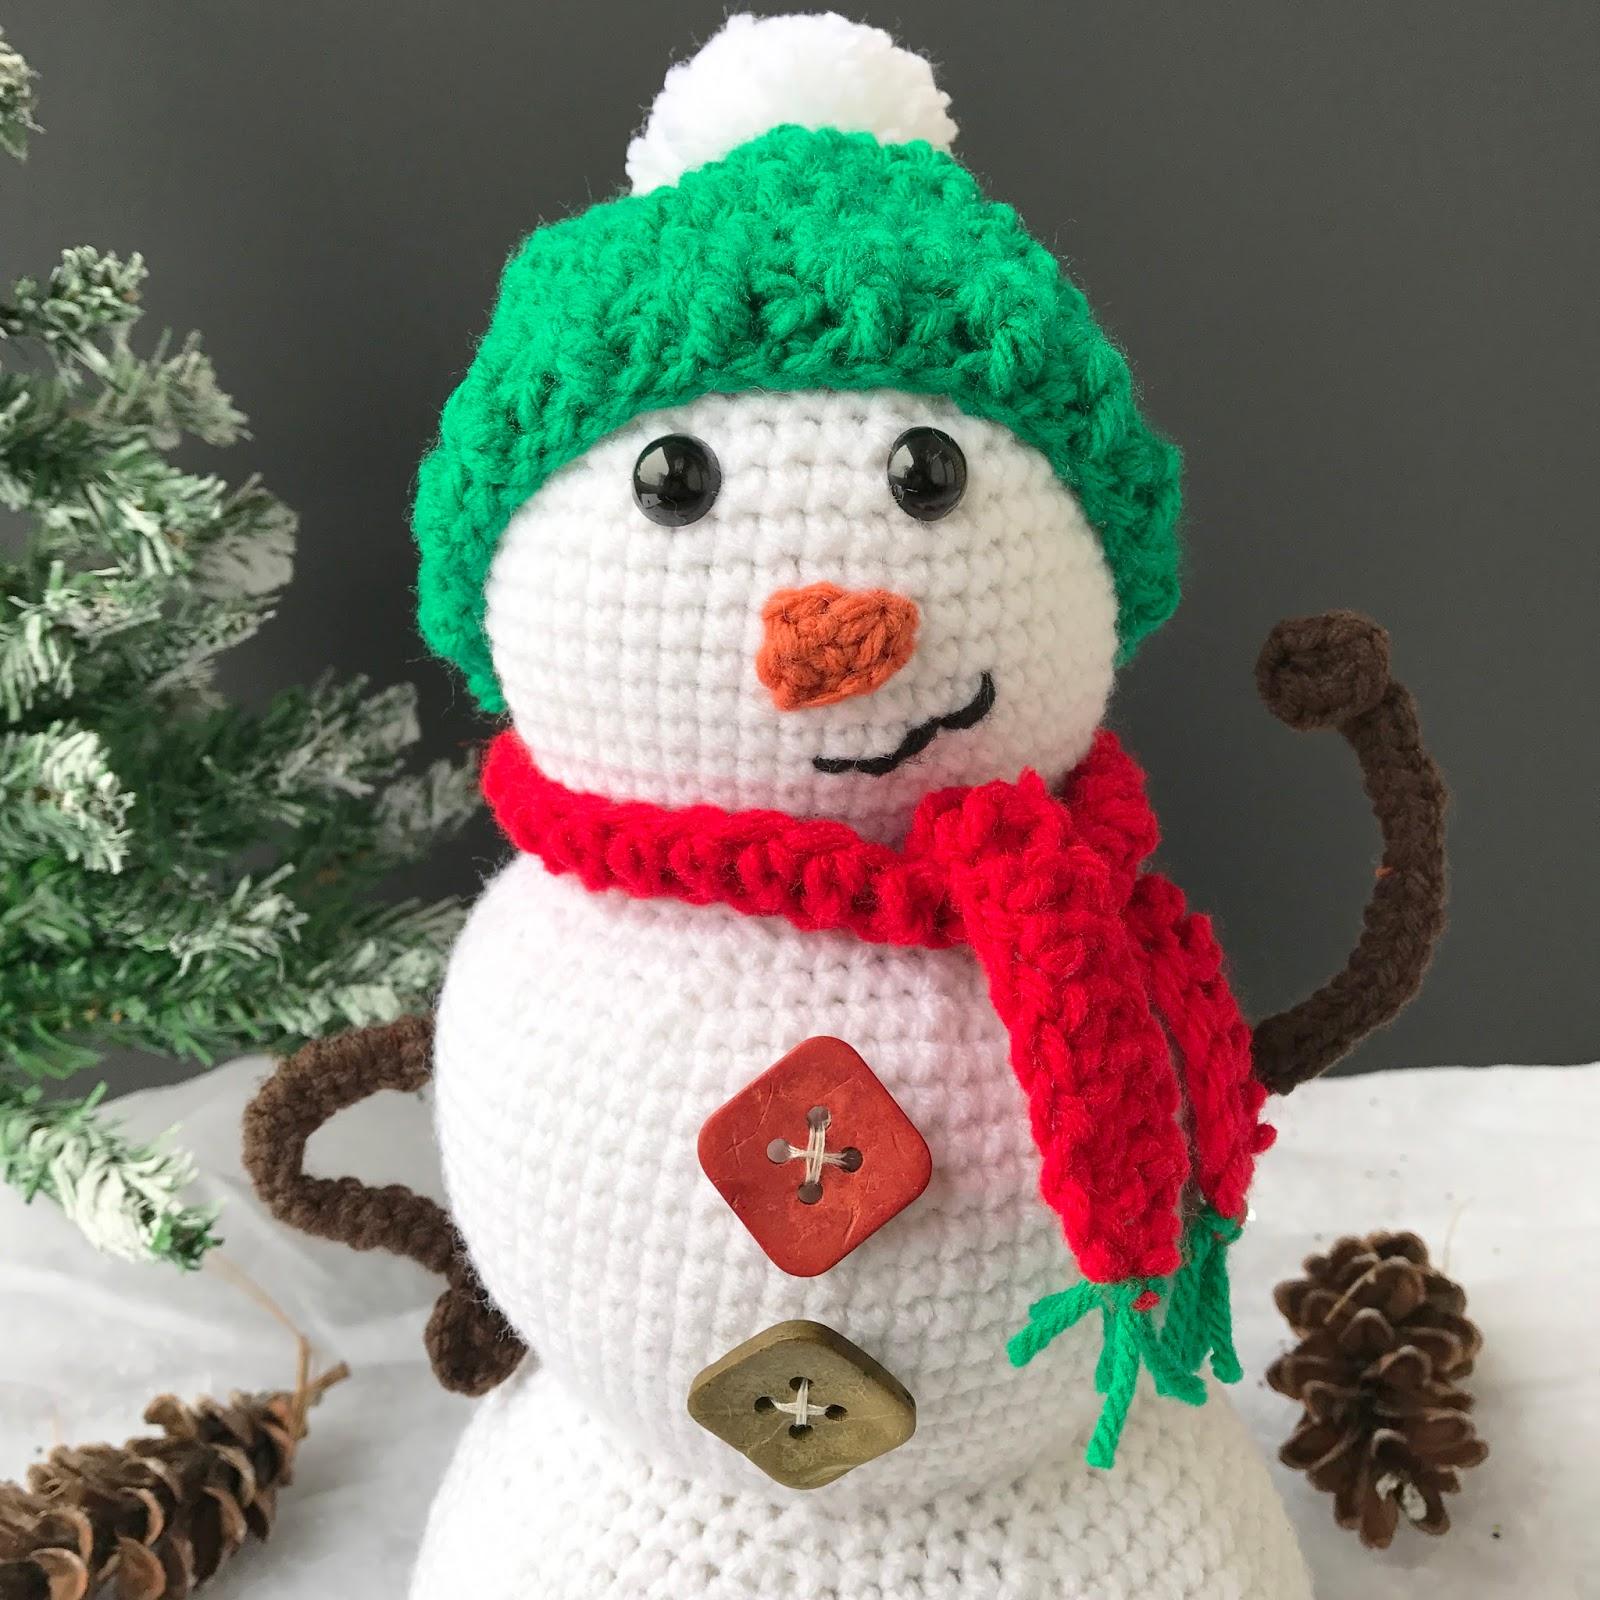 Snowman Amigurumi Crochet Pattern Part 3 Marias Blue Crayon